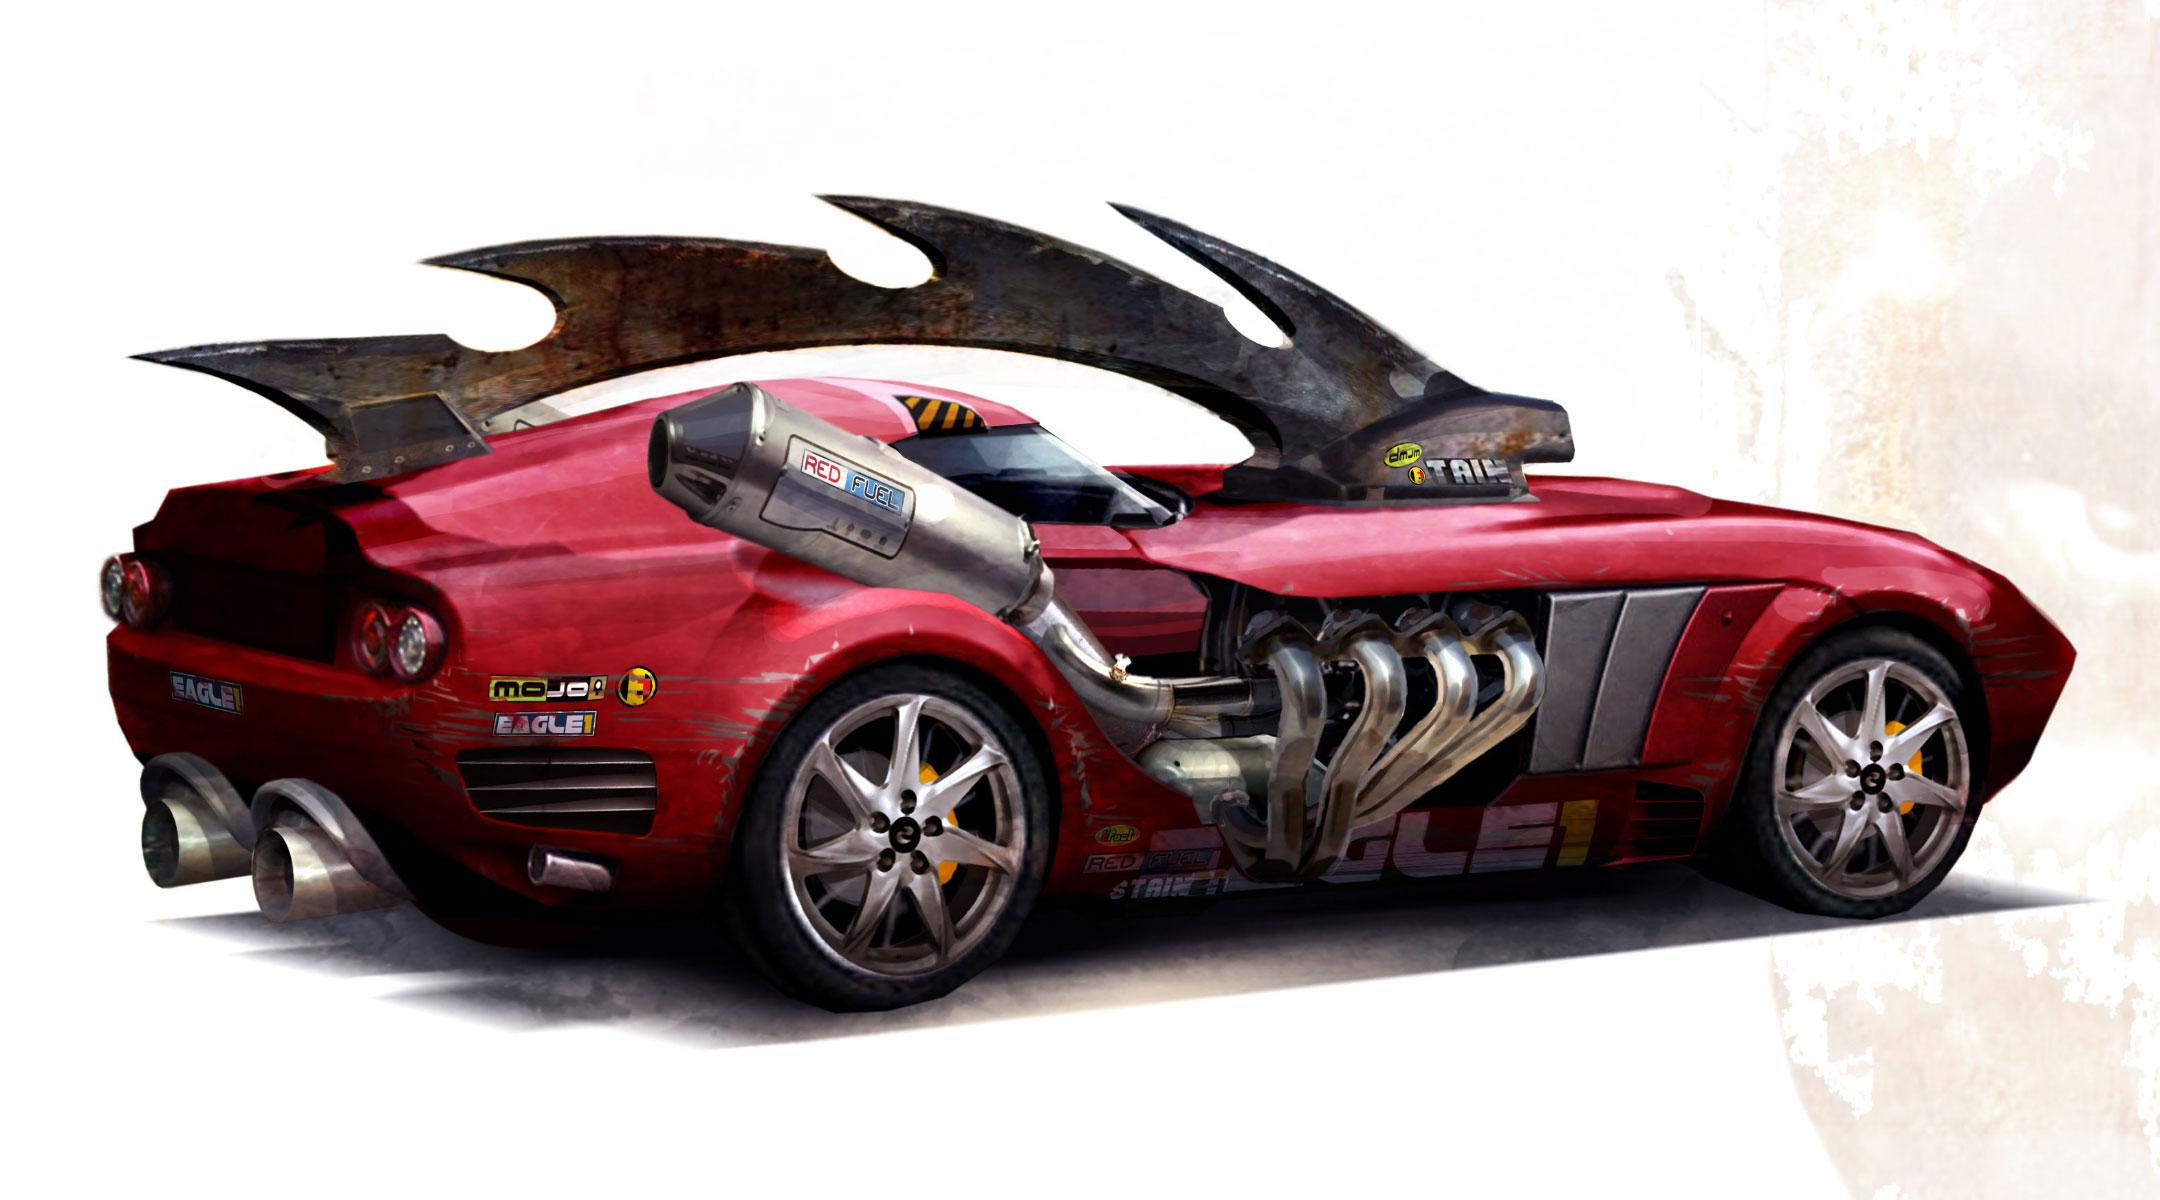 carmageddon-reincarnation 26092013